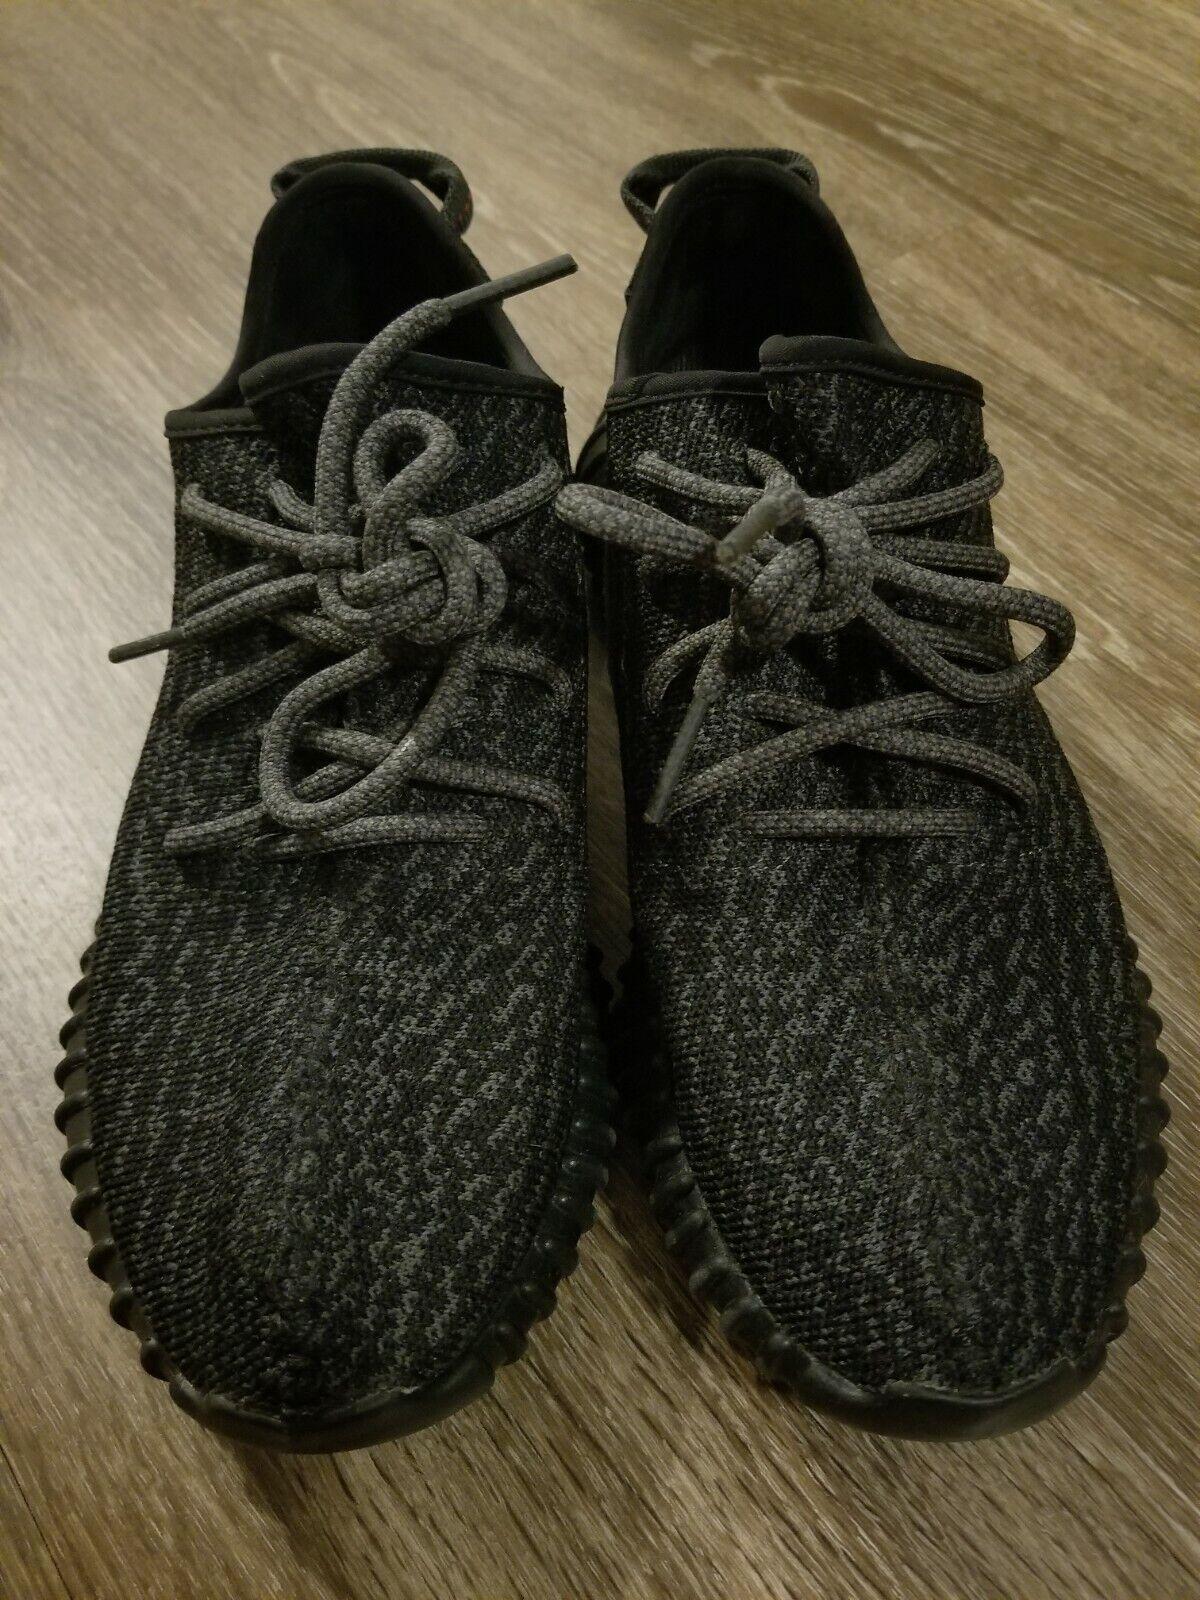 adidas yeezy boost 350 2015 pirate black | size 7 | 100